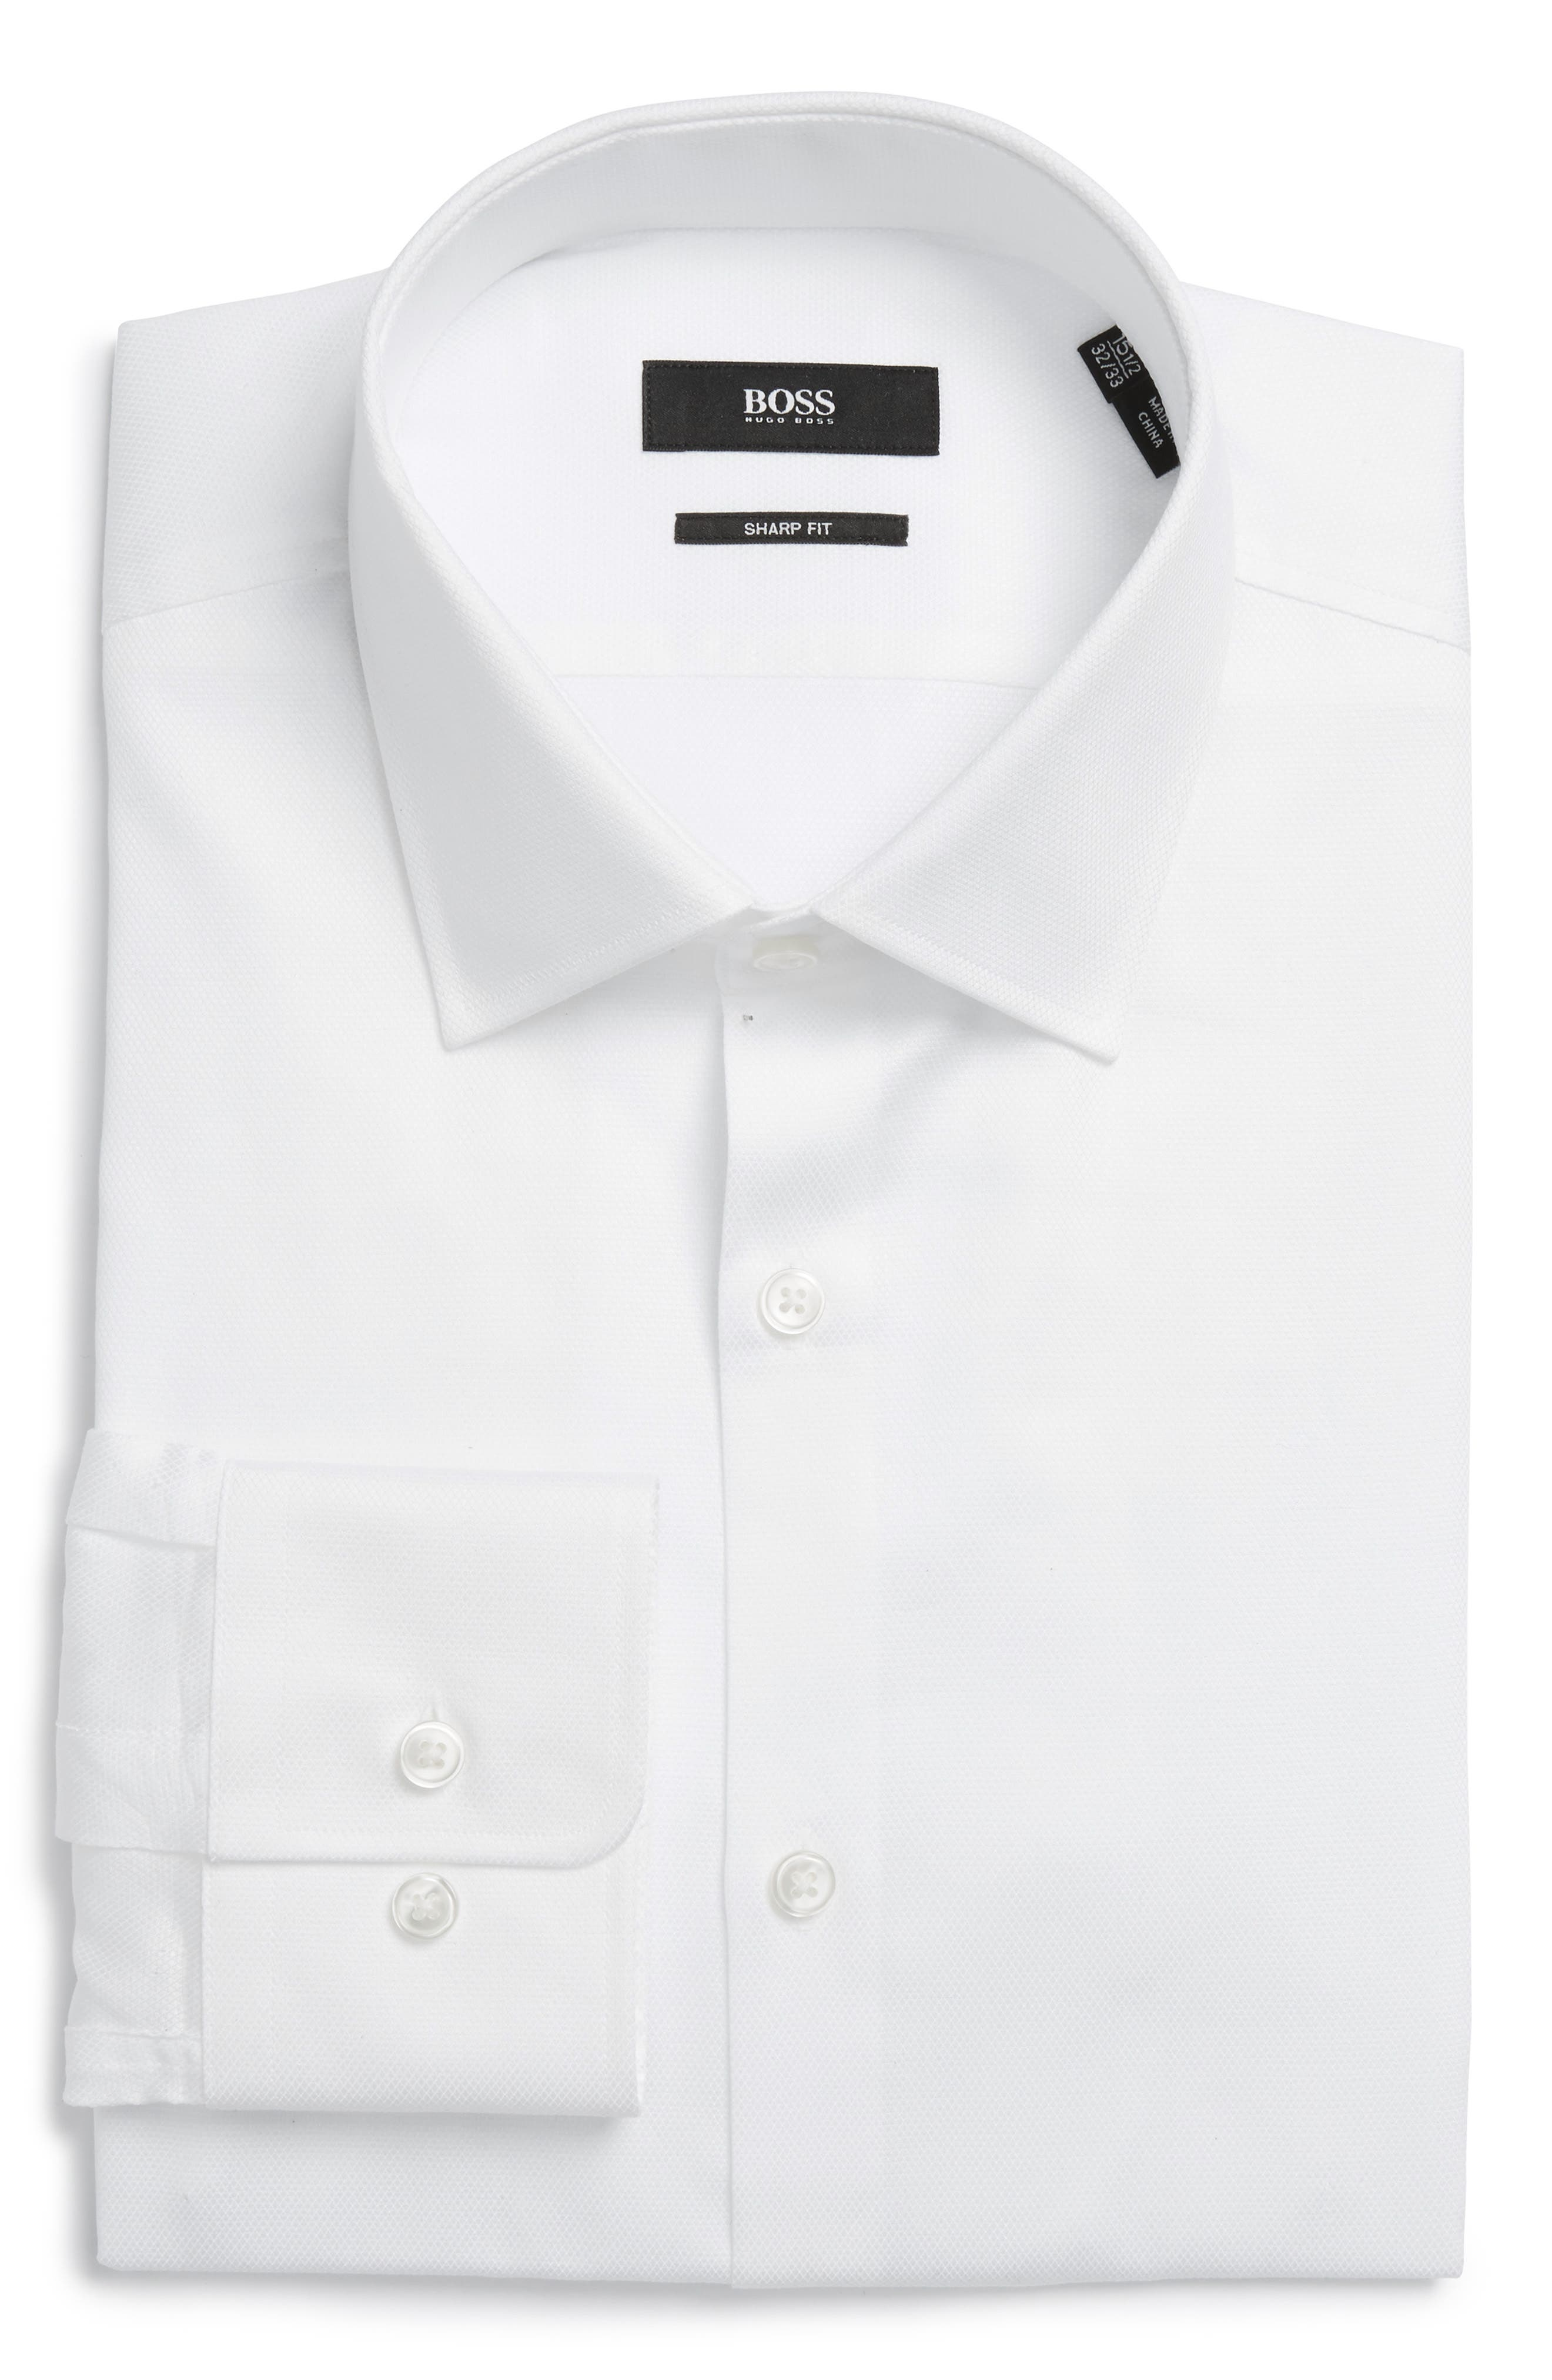 BOSS Marley US Sharp Fit Solid Dress Shirt